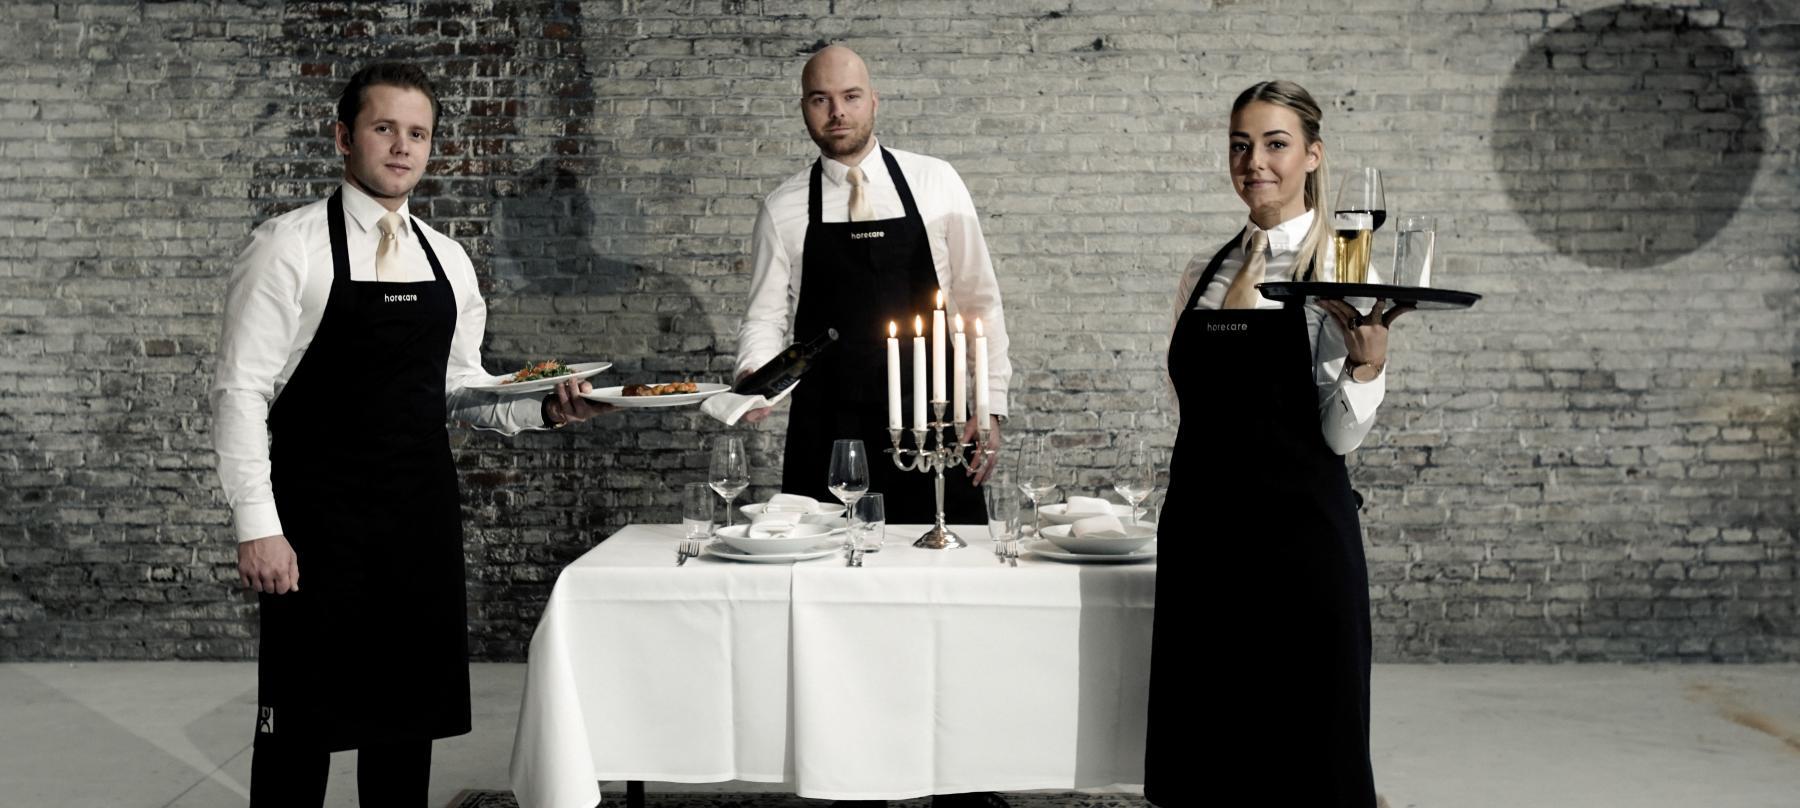 Horecare Events Personeel Payroll Maastricht Limburg Eindhoven Brabant Weert Venlo Roermond